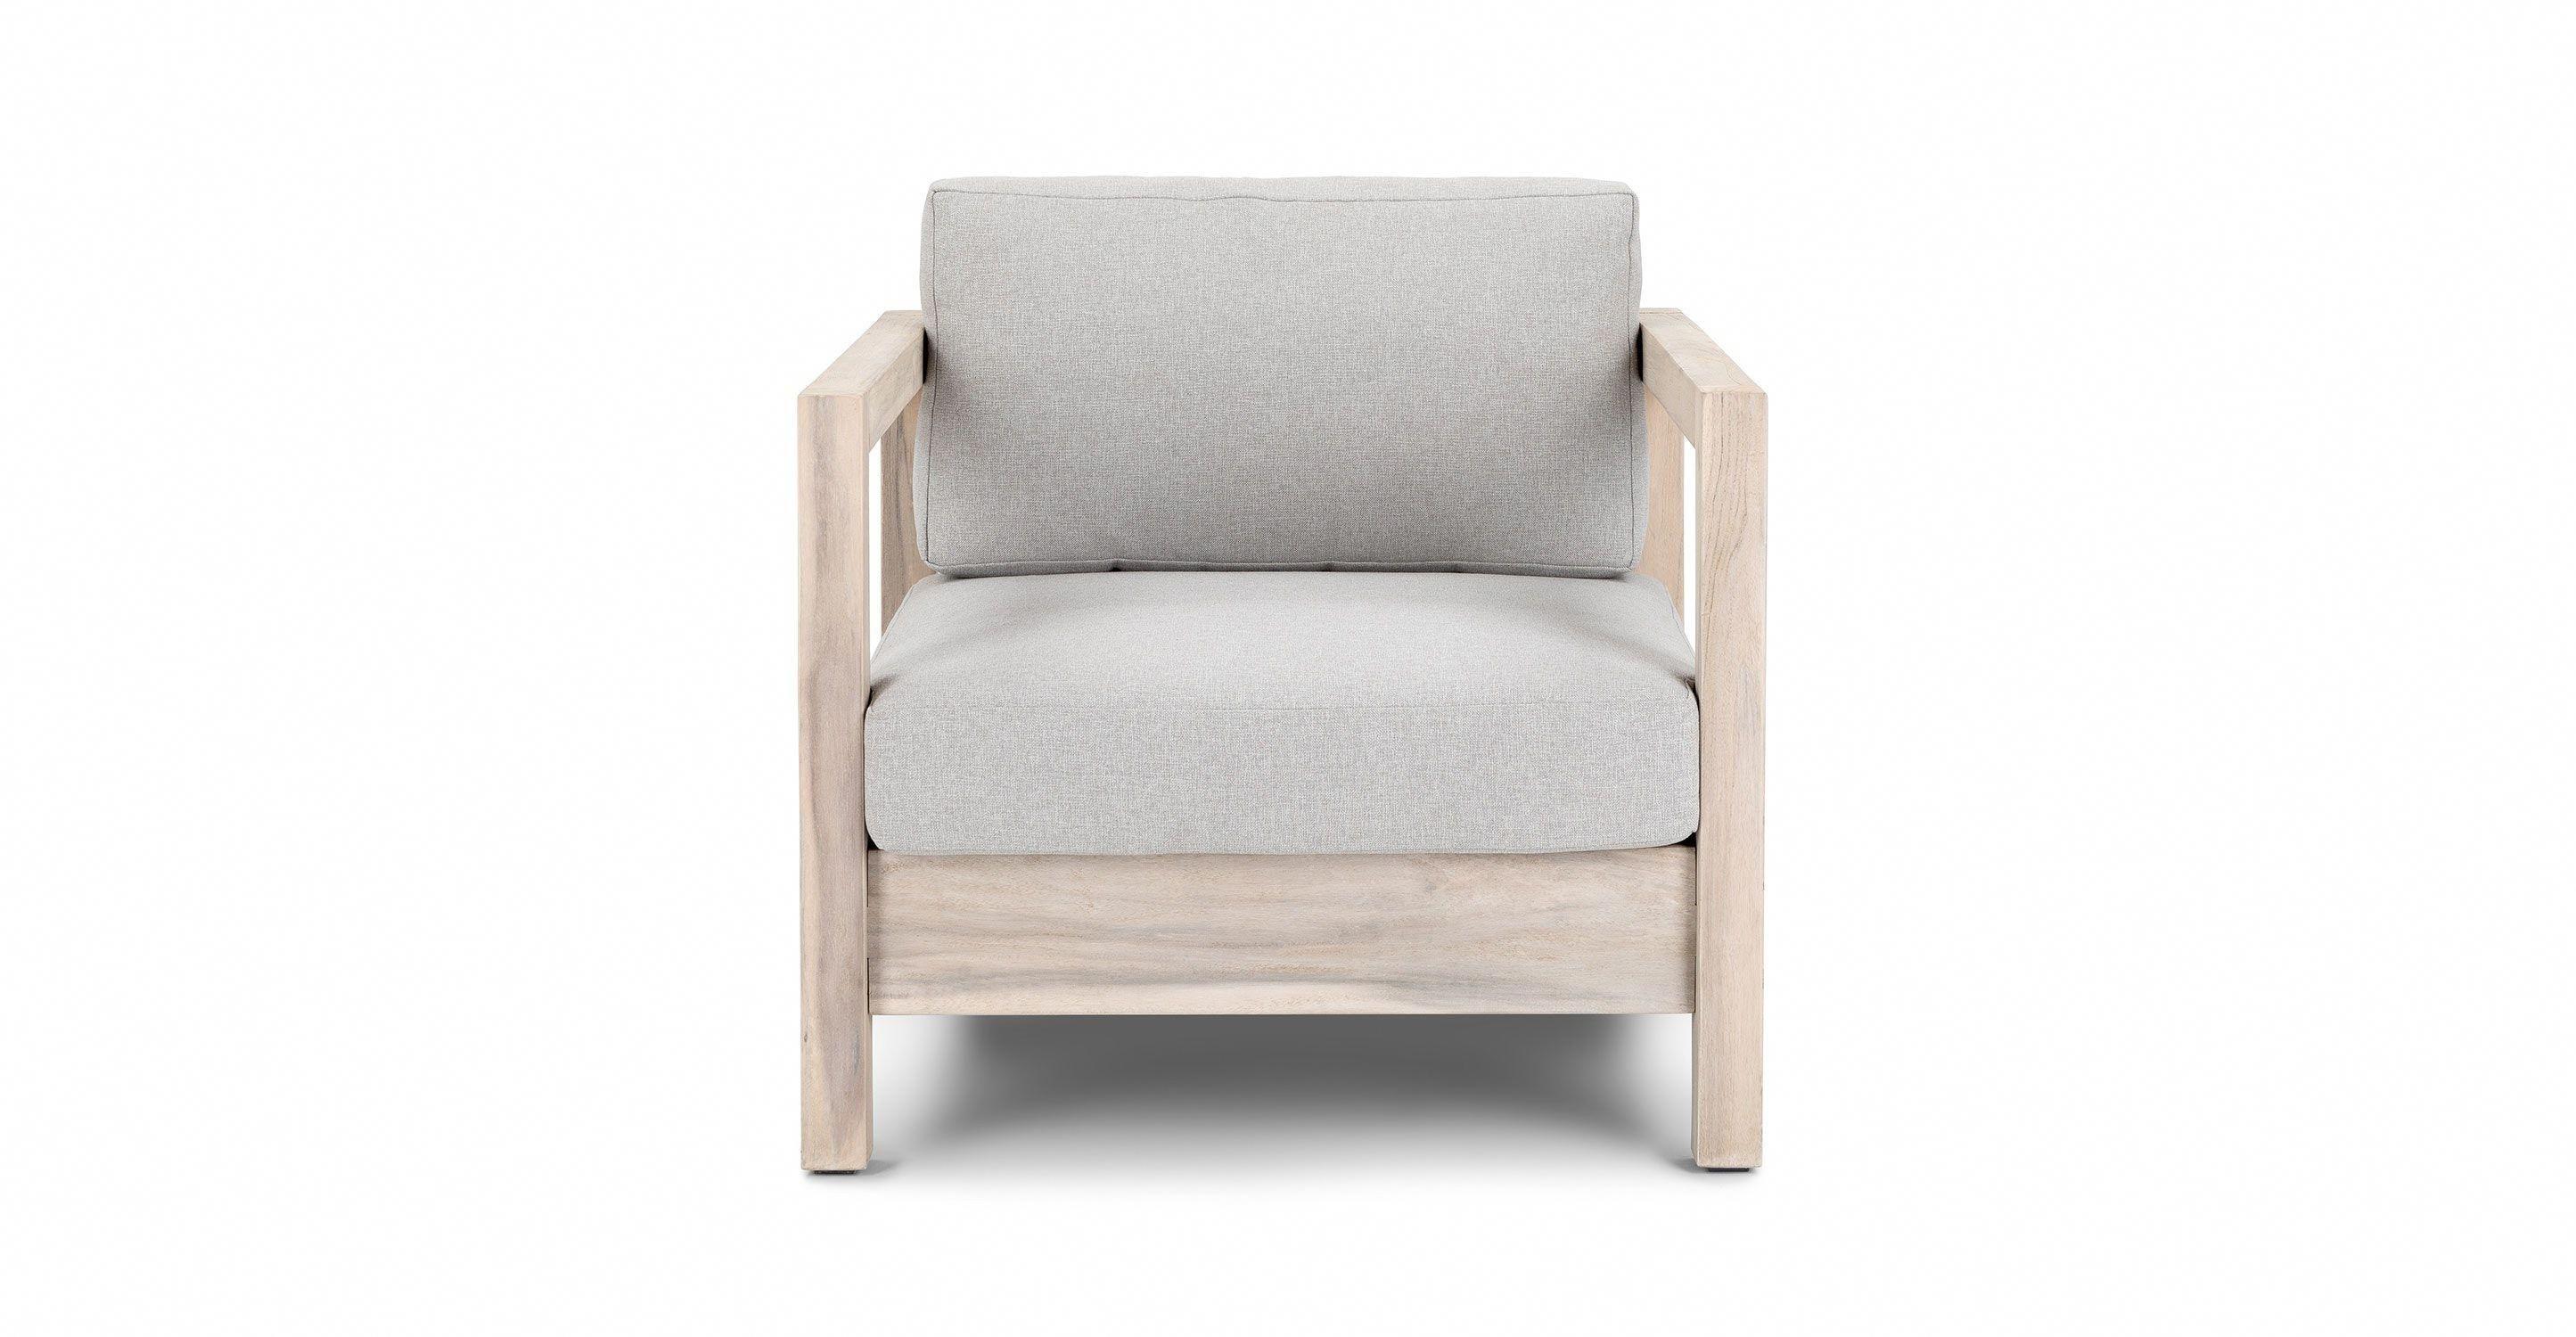 Arca driftwood gray lounge chair lounge chairs article modern mid century and scandinavian furniture outdoorloungechairs